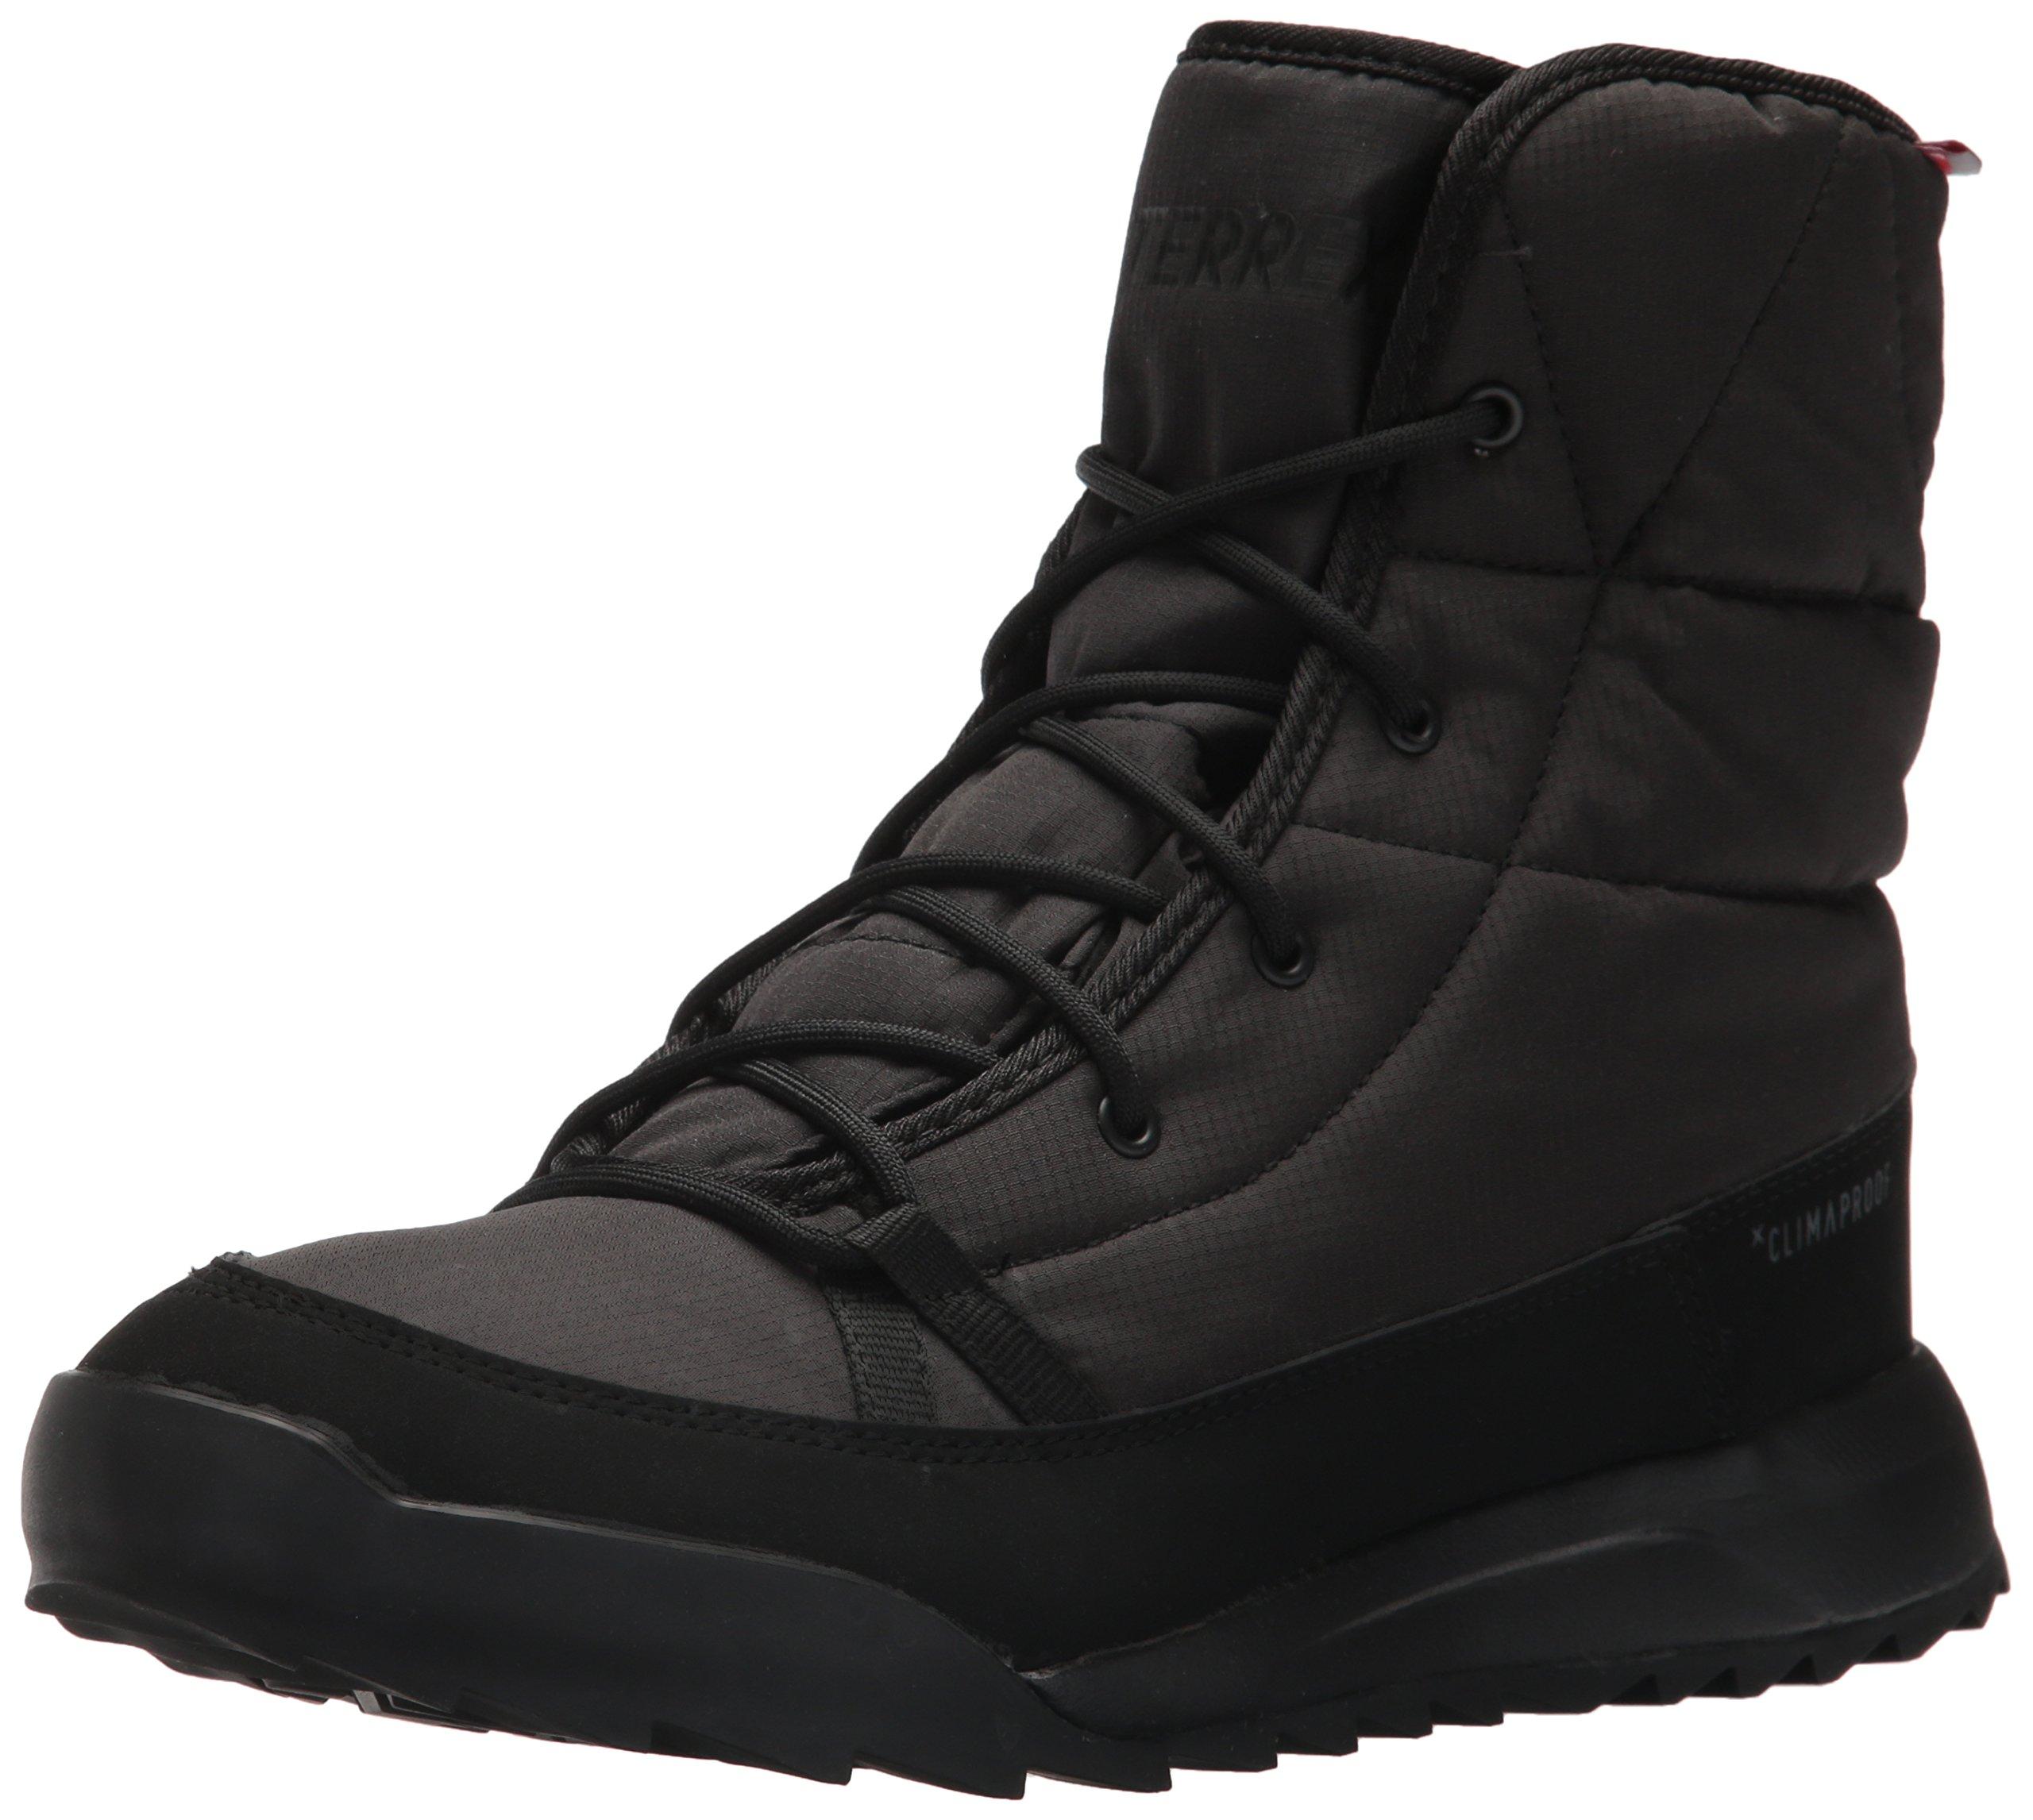 adidas Outdoor Women's Terrex Choleah Padded CP Walking-Shoes, Black/Chalk White/Grey Five, 7 M US